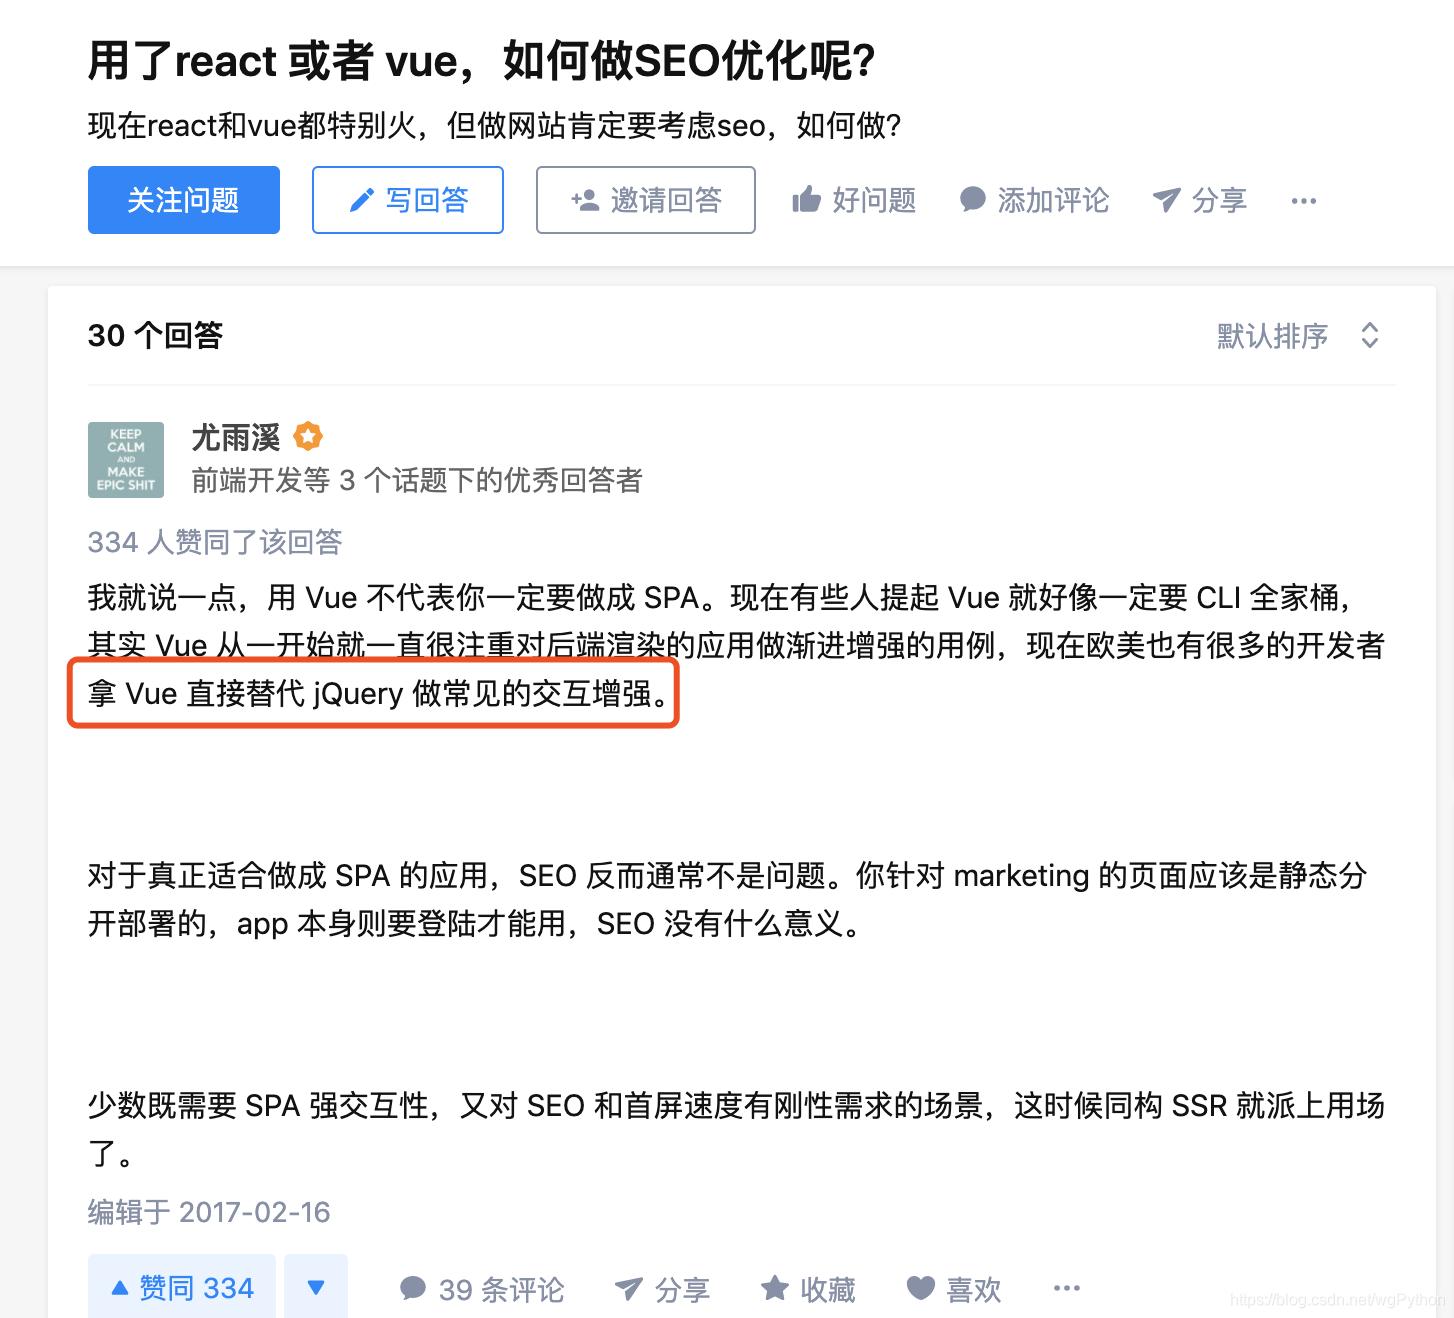 参考知乎 https://www.zhihu.com/question/51949678